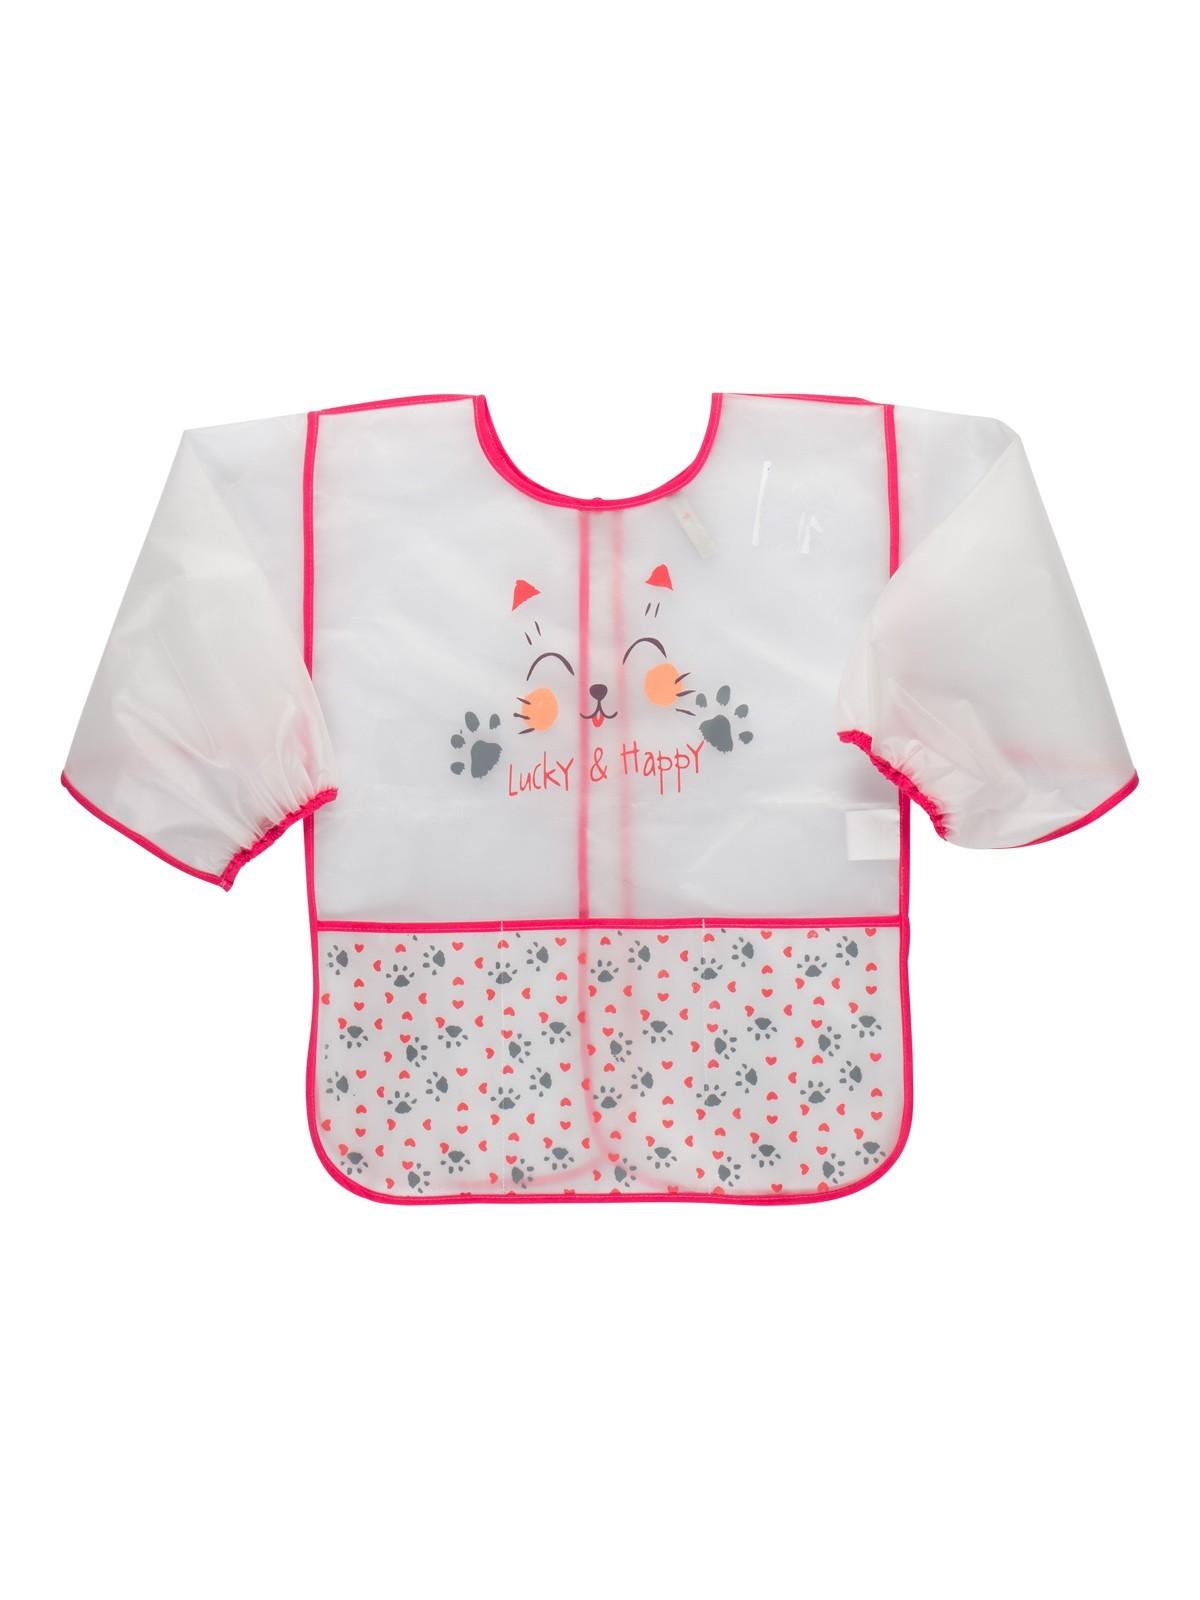 Coton Tout Nouveau Adroit Wrangler Boys&teens Polo Rayé Shirts Taille 10-12 Années